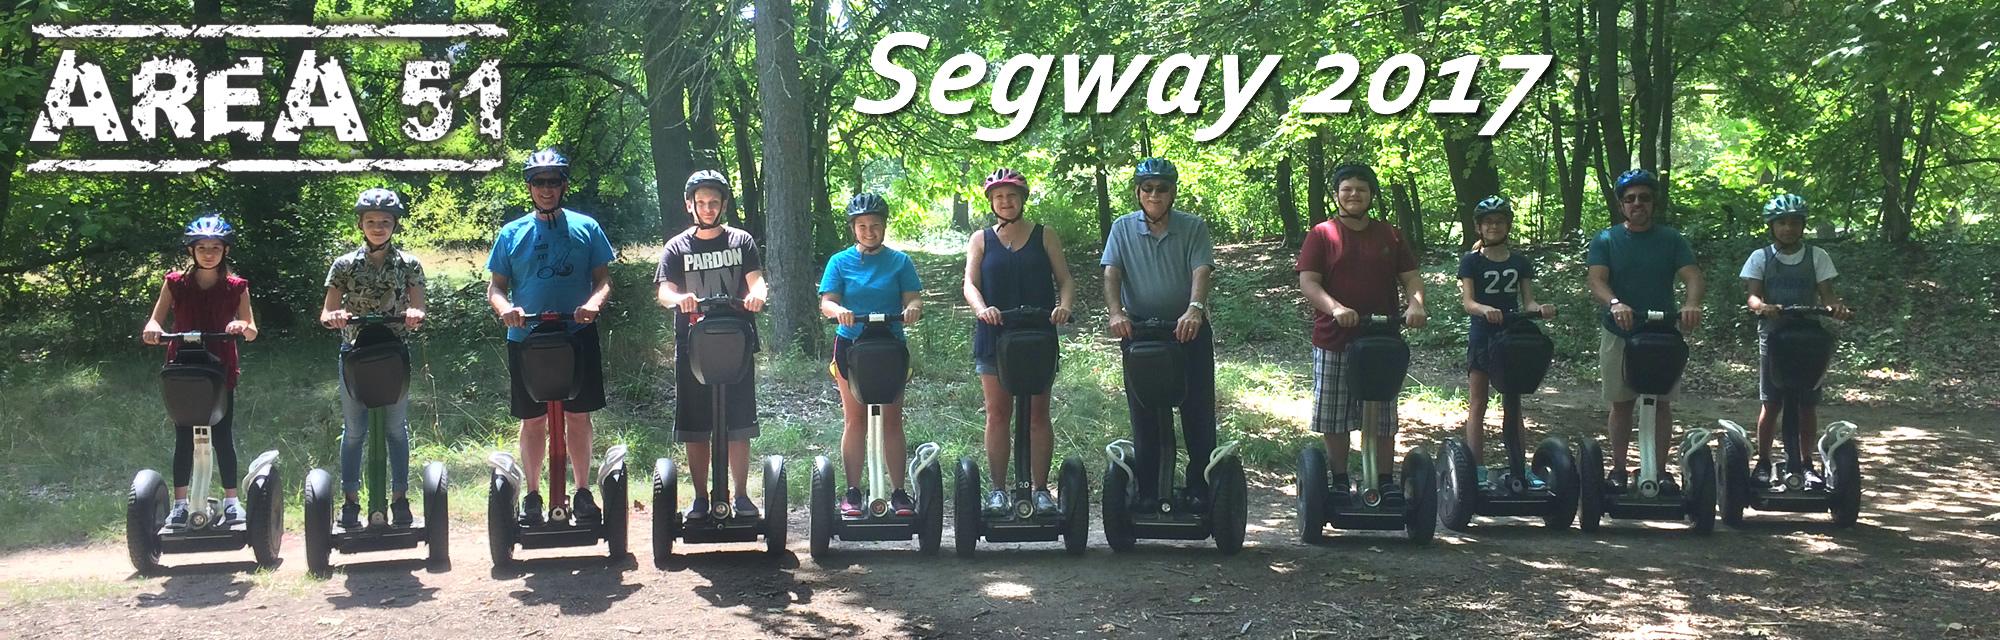 Segway 2017